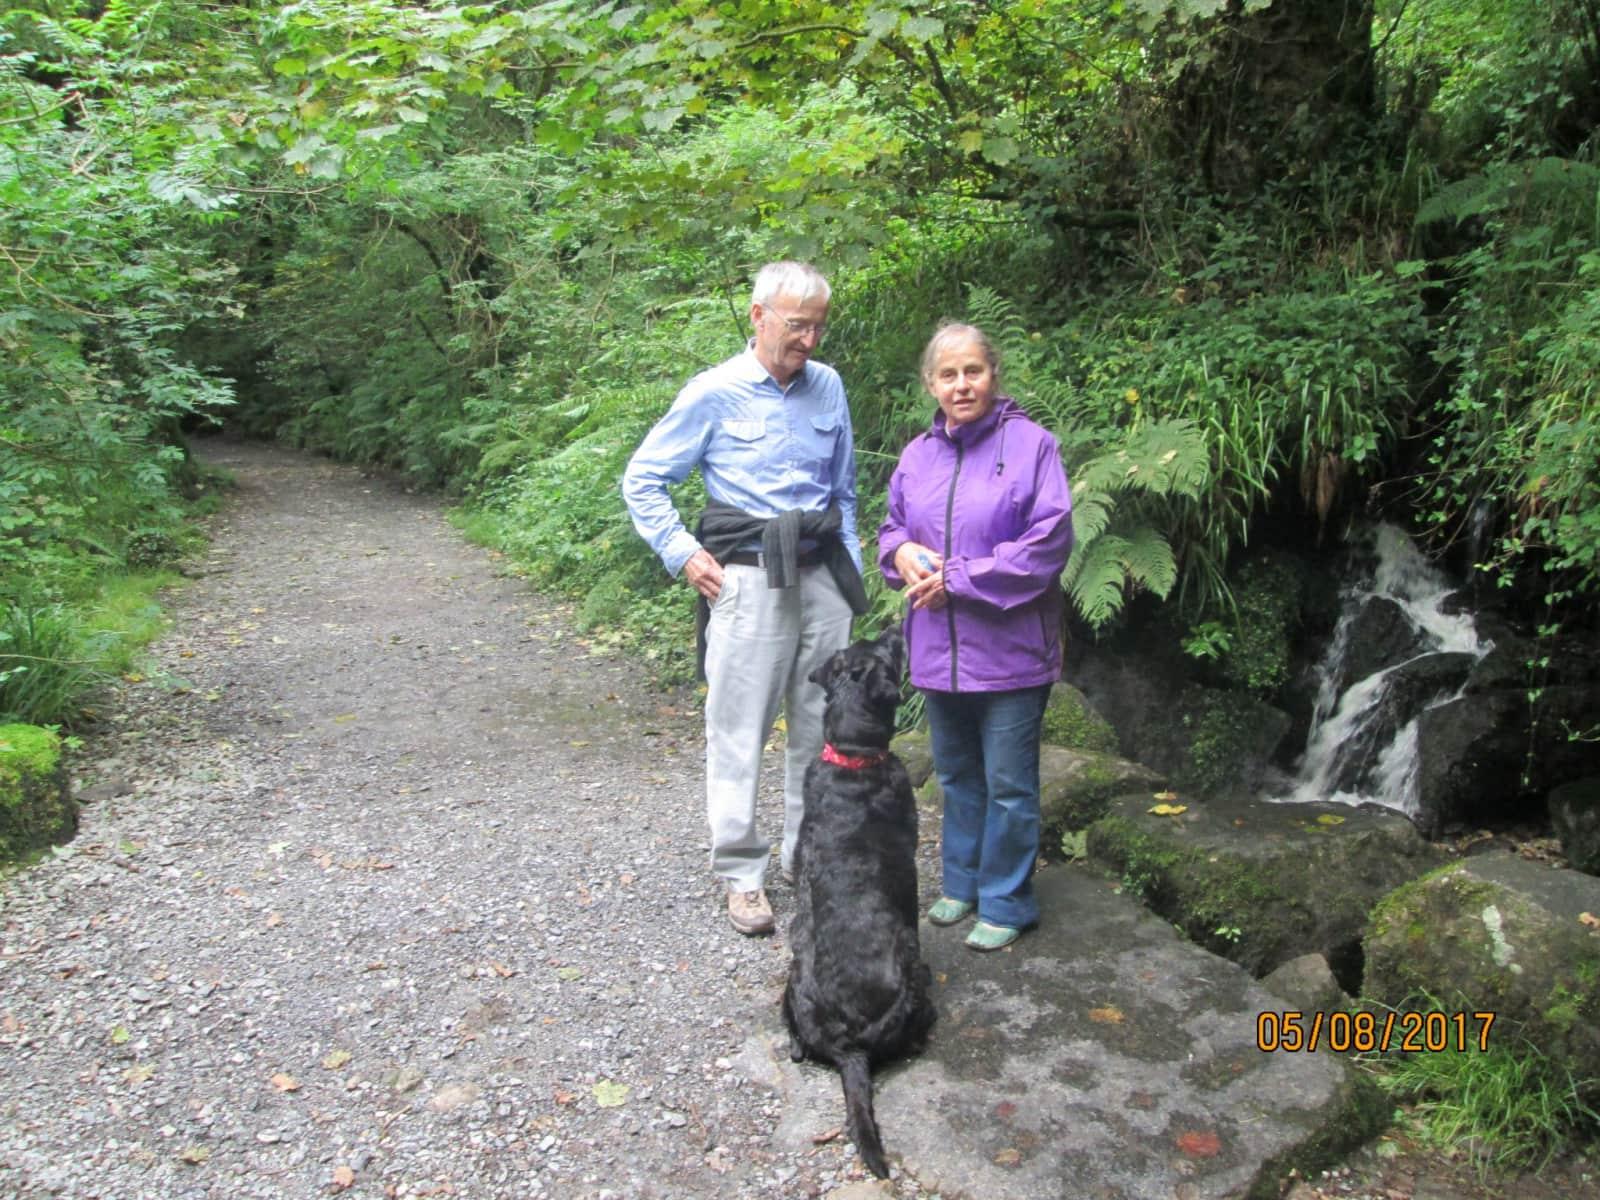 Helen & Derek from Wellington, New Zealand